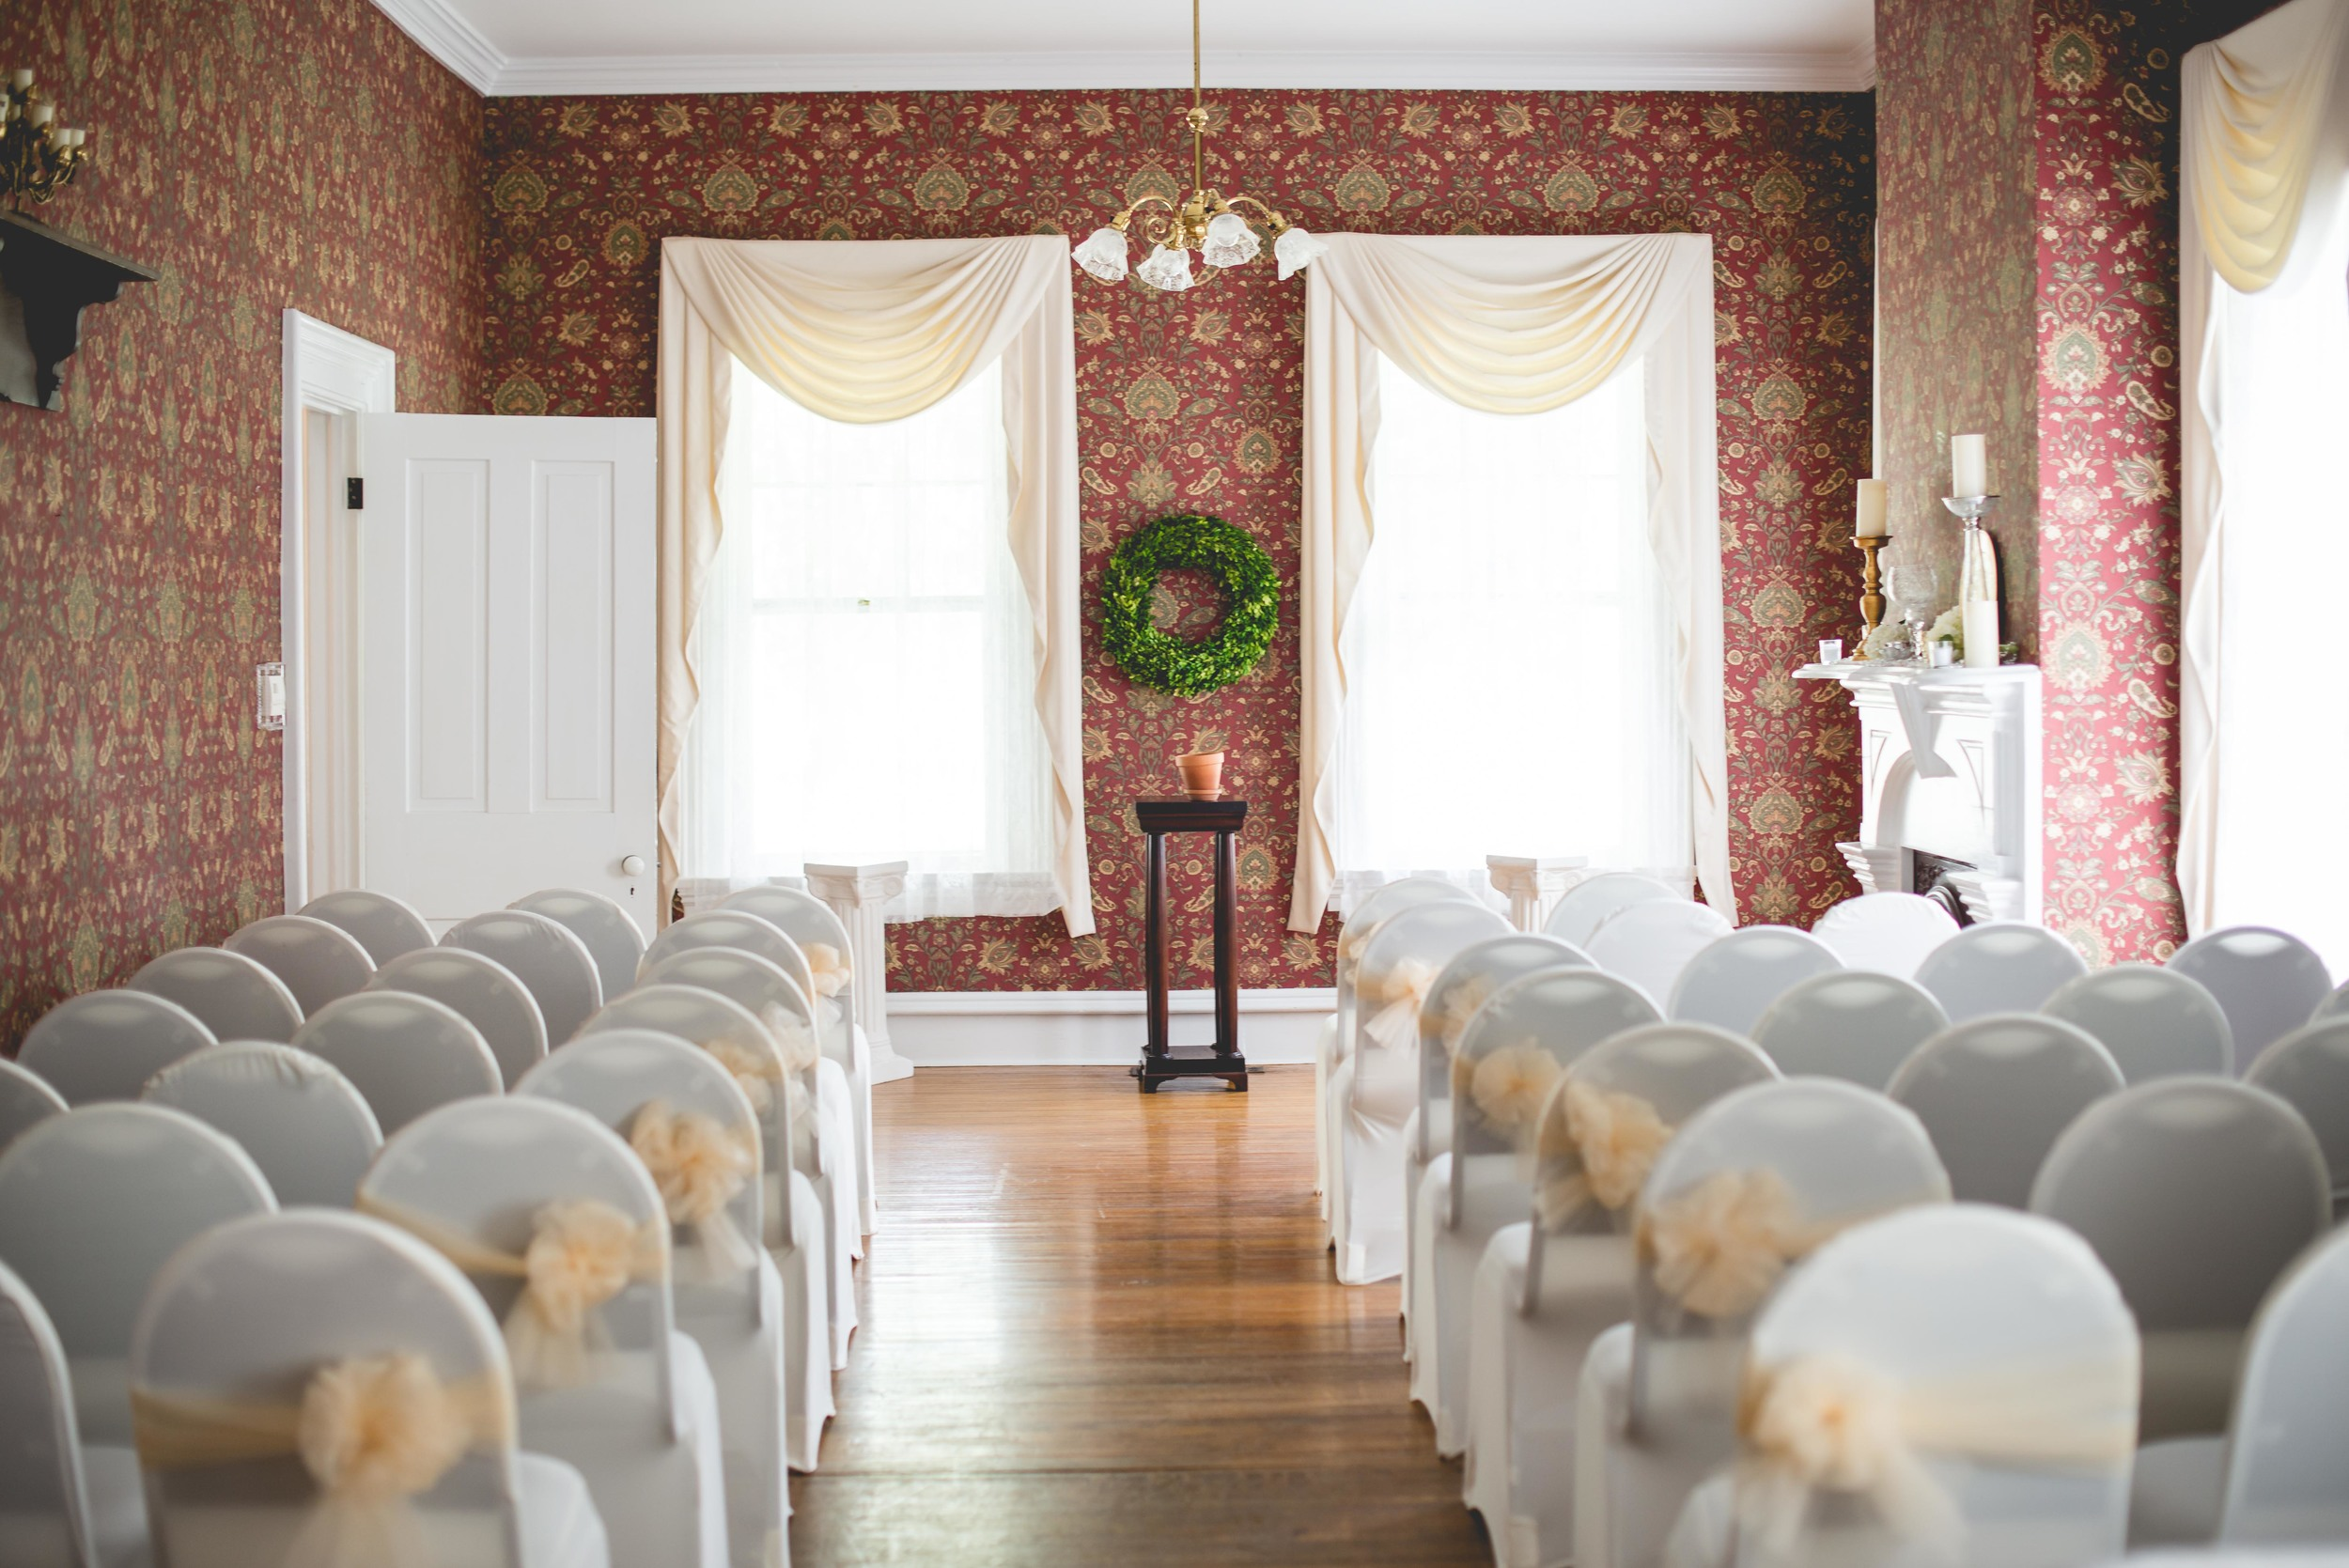 sarasutterphotography_leeandshalon_wedding_2015-69.jpg